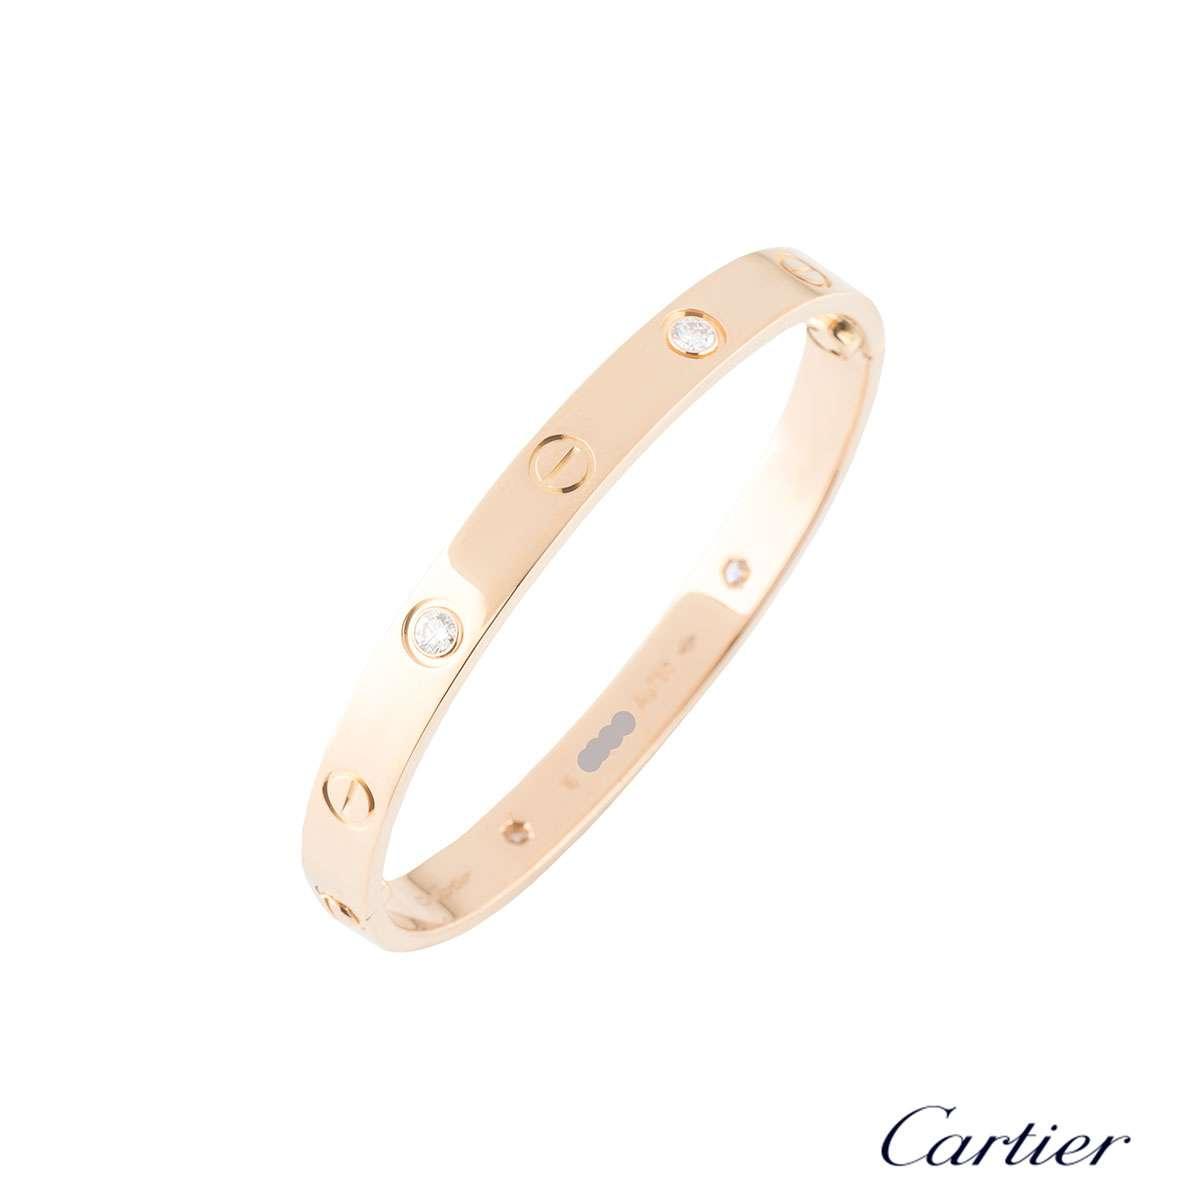 Cartier Rose Gold Half DiamondLove Bracelet Size 18 B6036018